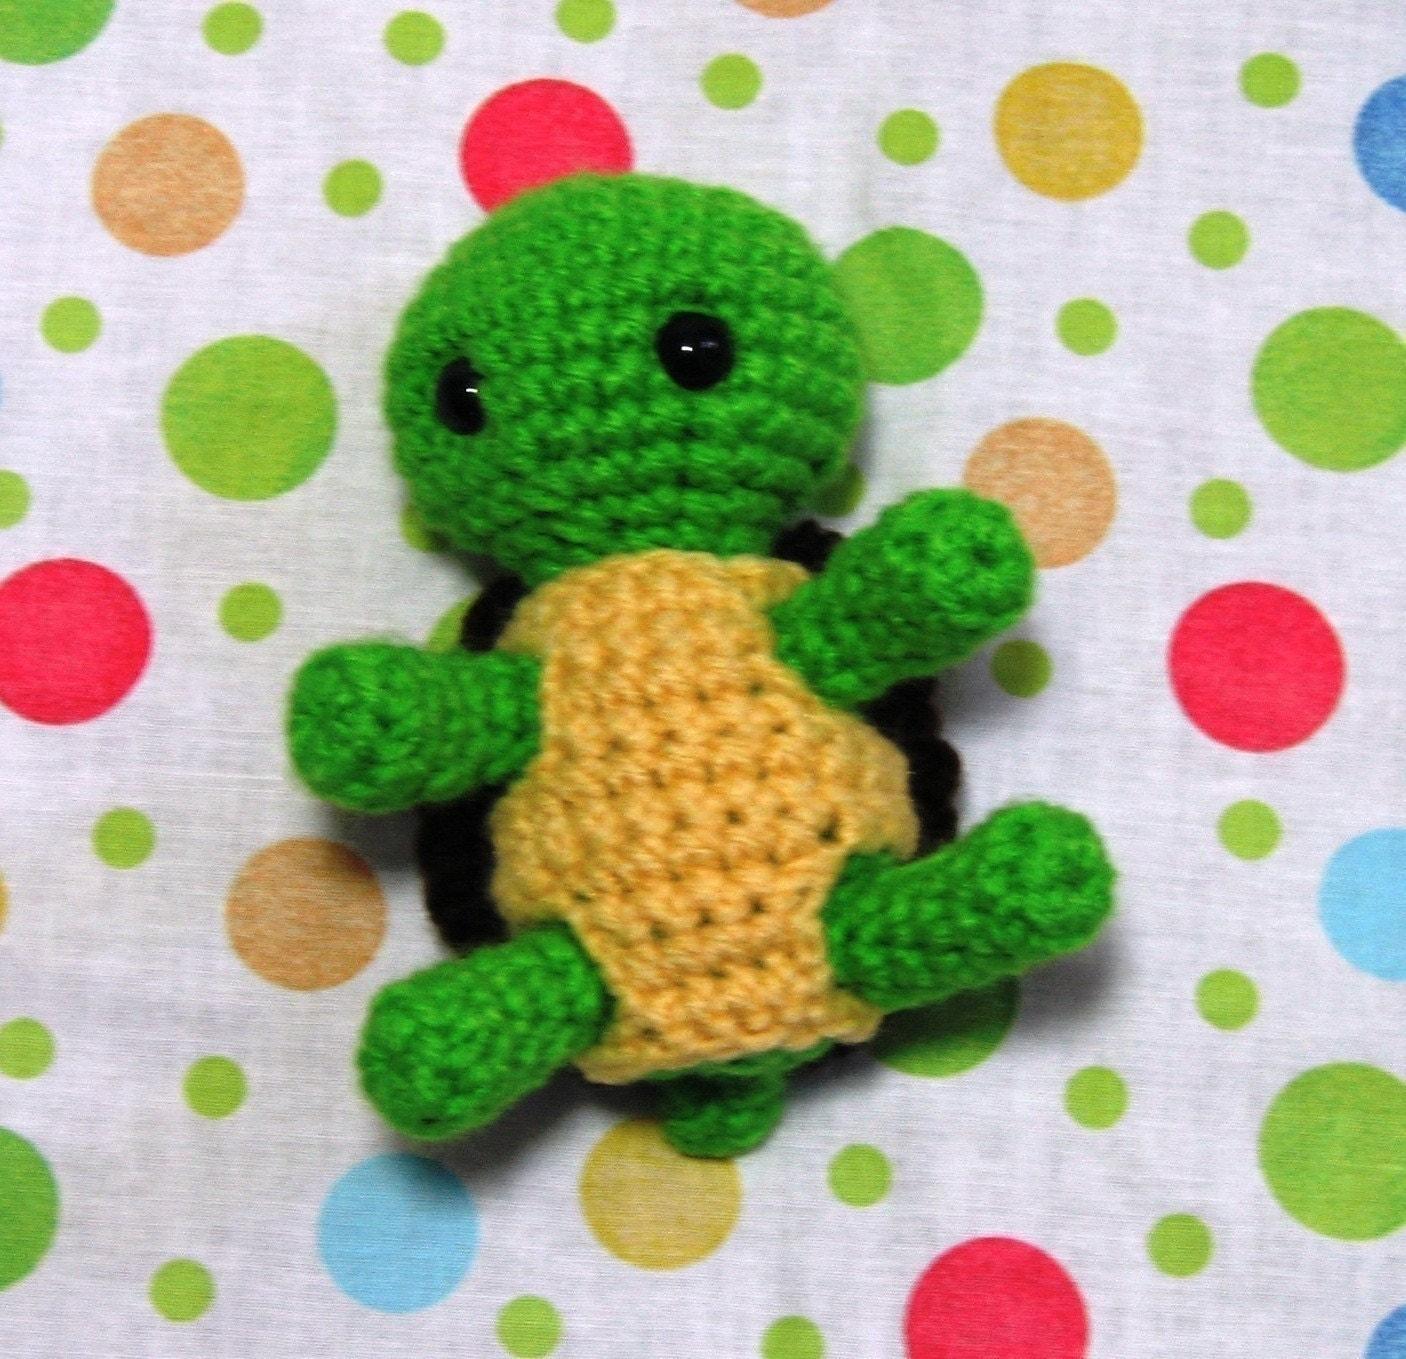 Items similar to PDF CROCHET PATTERN - Baby Turtle on Etsy